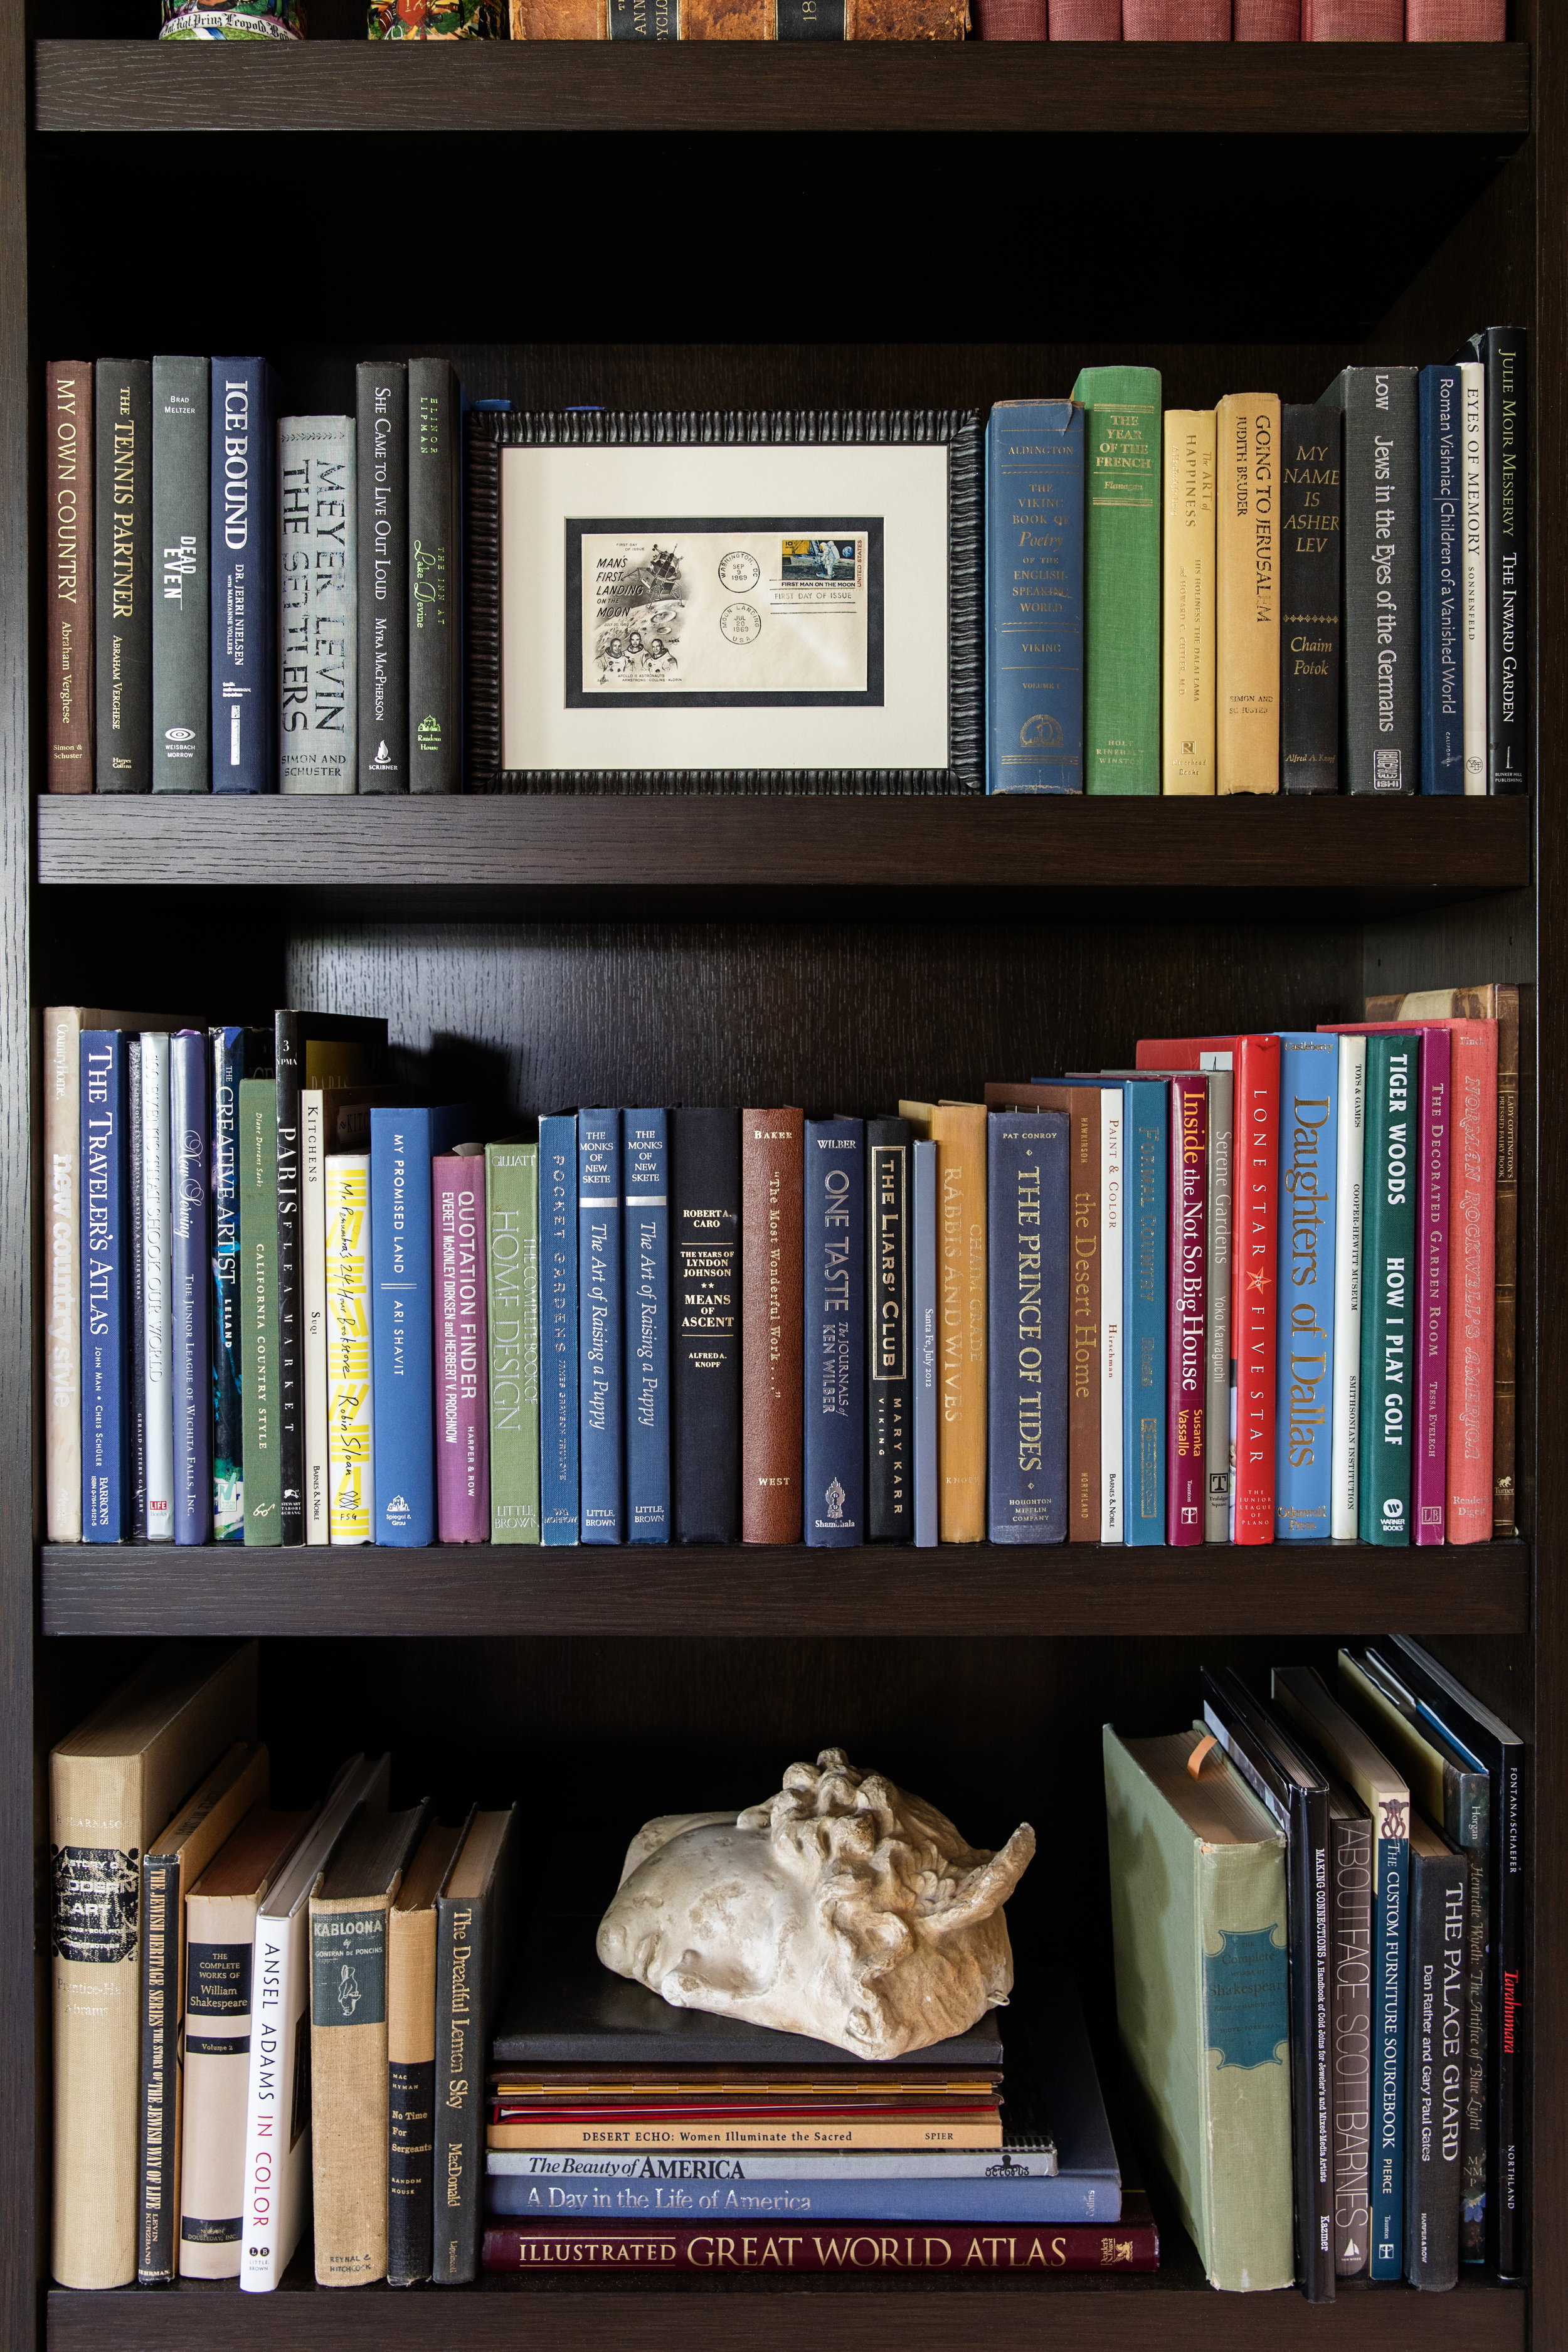 Books, books and more beautiful books.